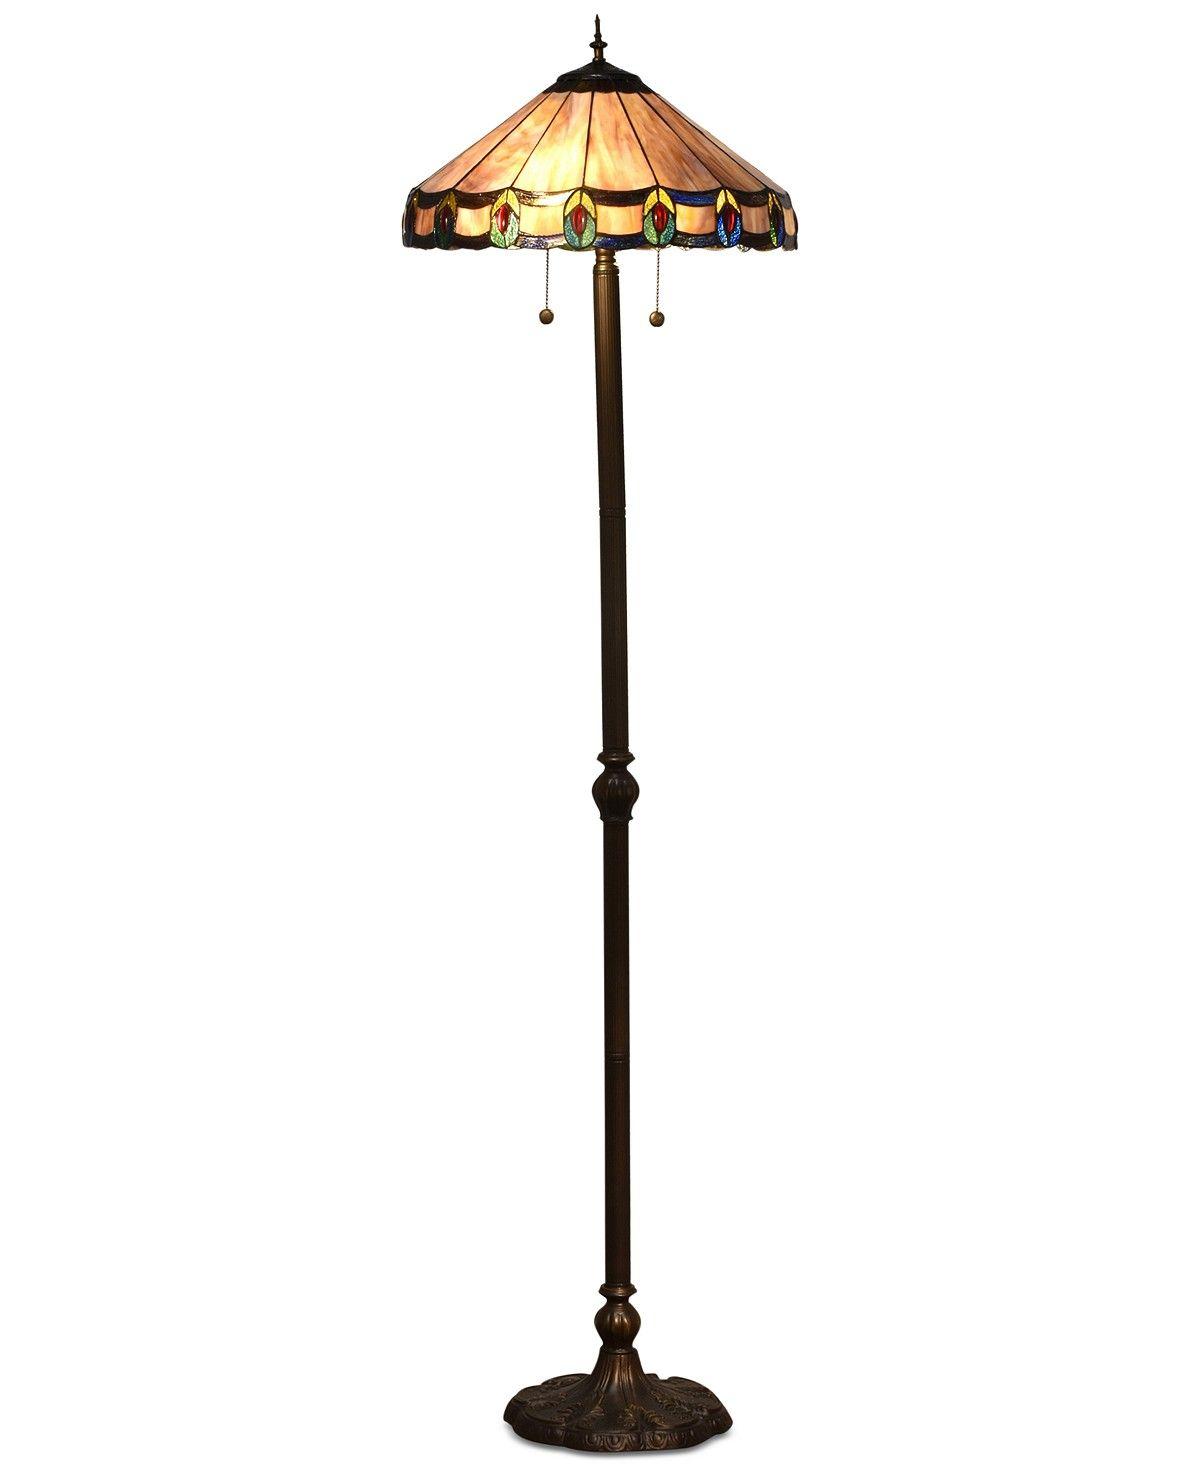 Dale Tiffany Townsville Glass Floor Lamp Reviews All Lighting Home Decor Macy S Glass Floor Floor Lamp Decor